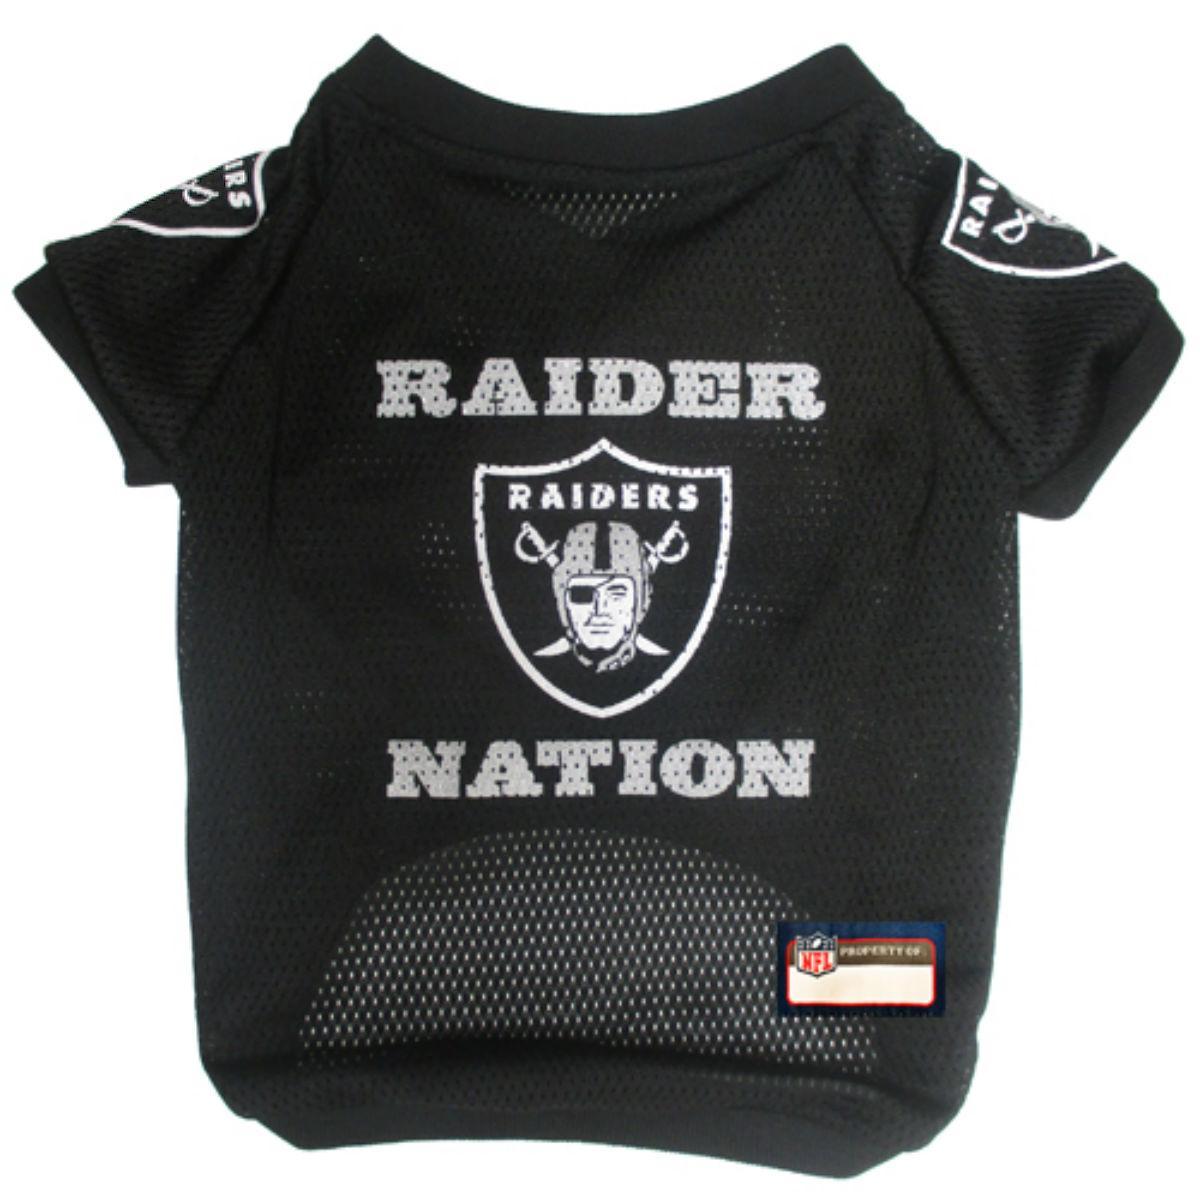 Oakland Raiders Slogan Dog Jersey - Raider Nation